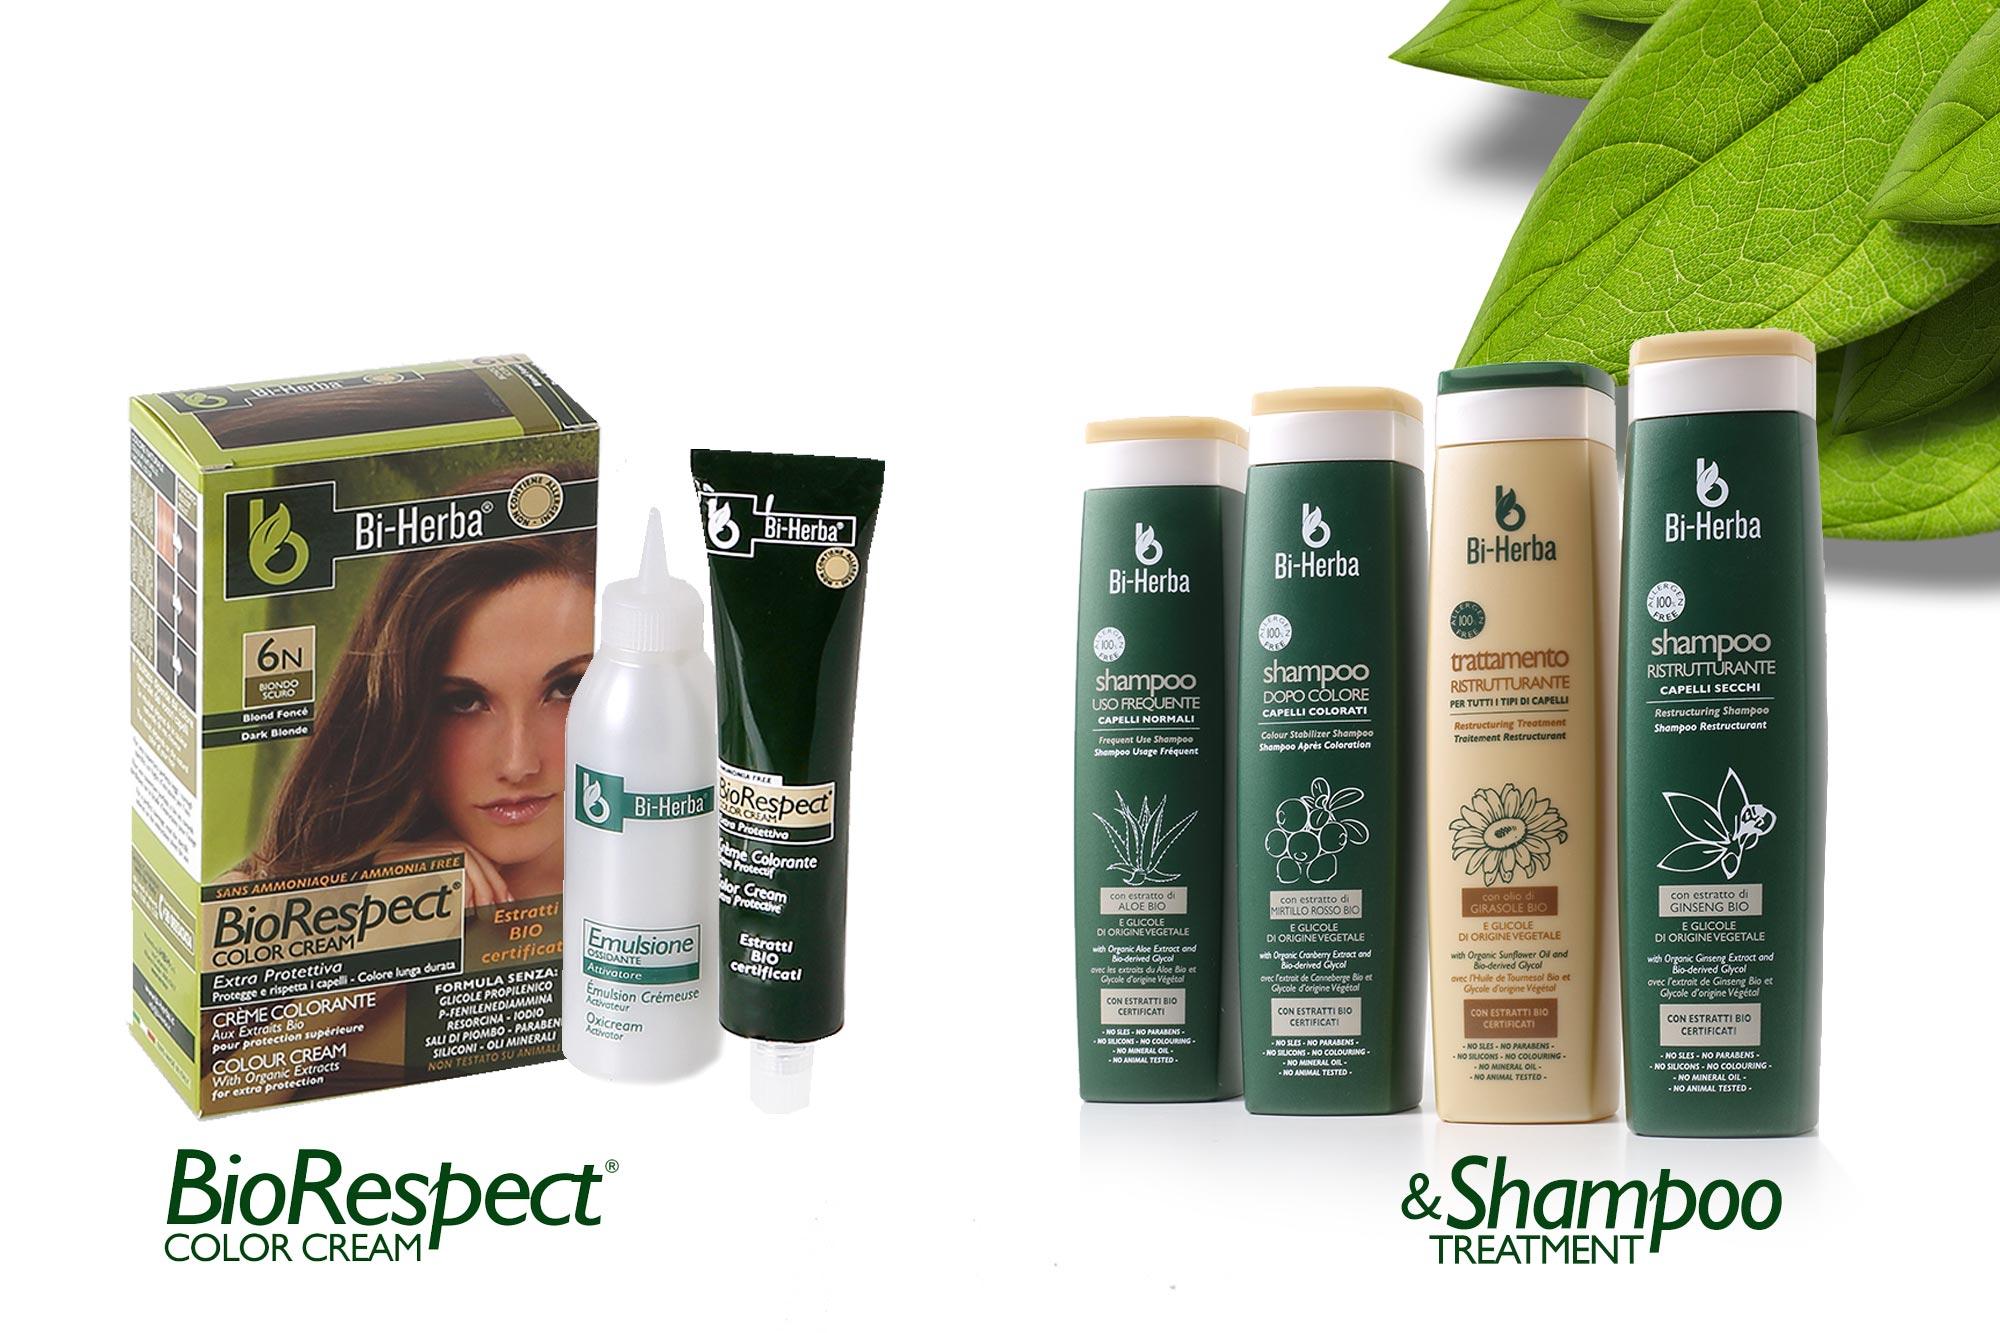 Bi-Herba Product